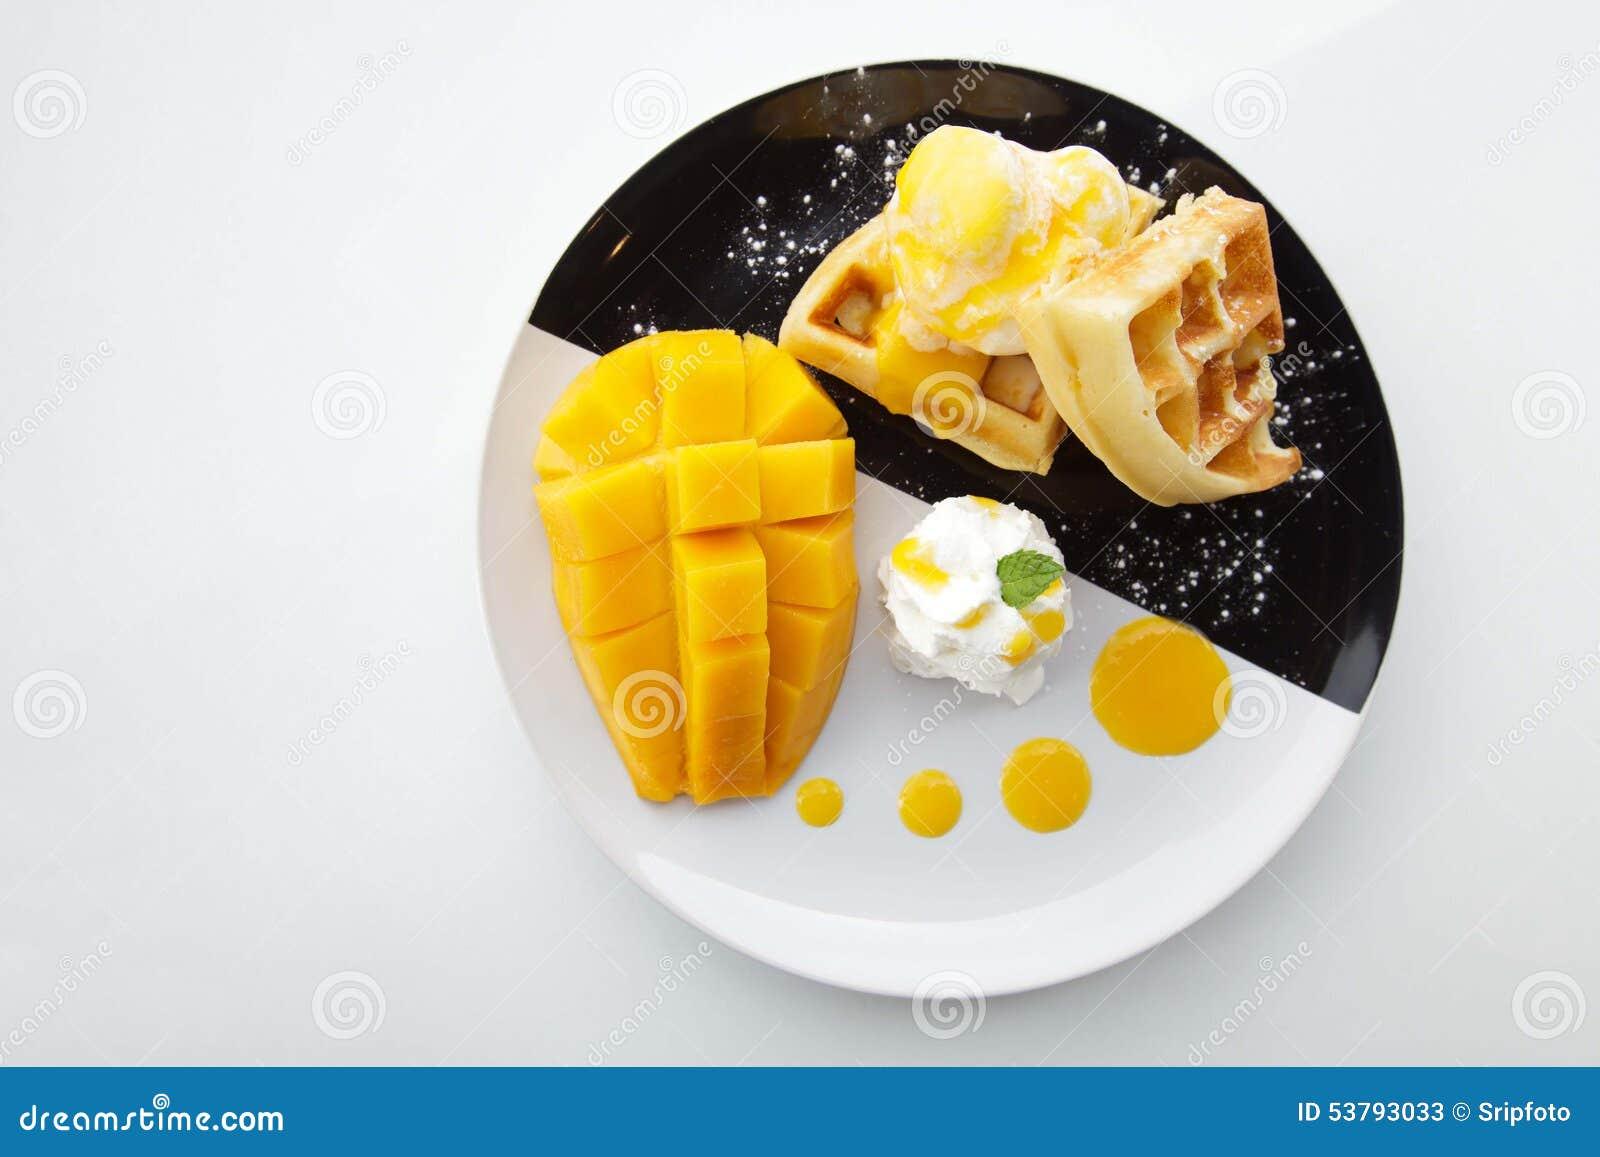 Gofry z lody i mango